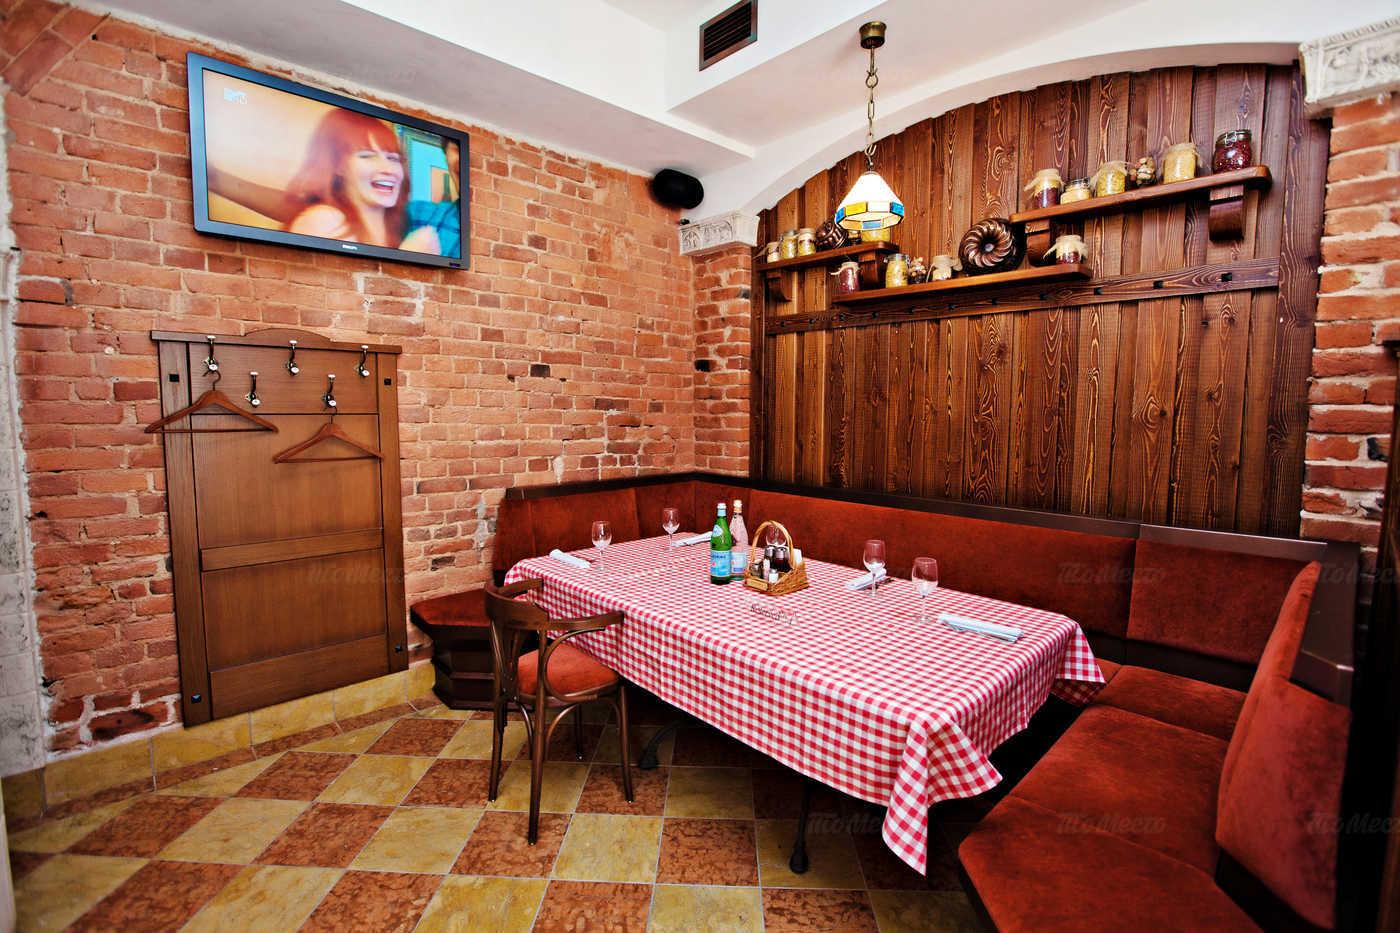 Ресторан Мама Рома (Mama Roma) на Невском проспекте фото 10